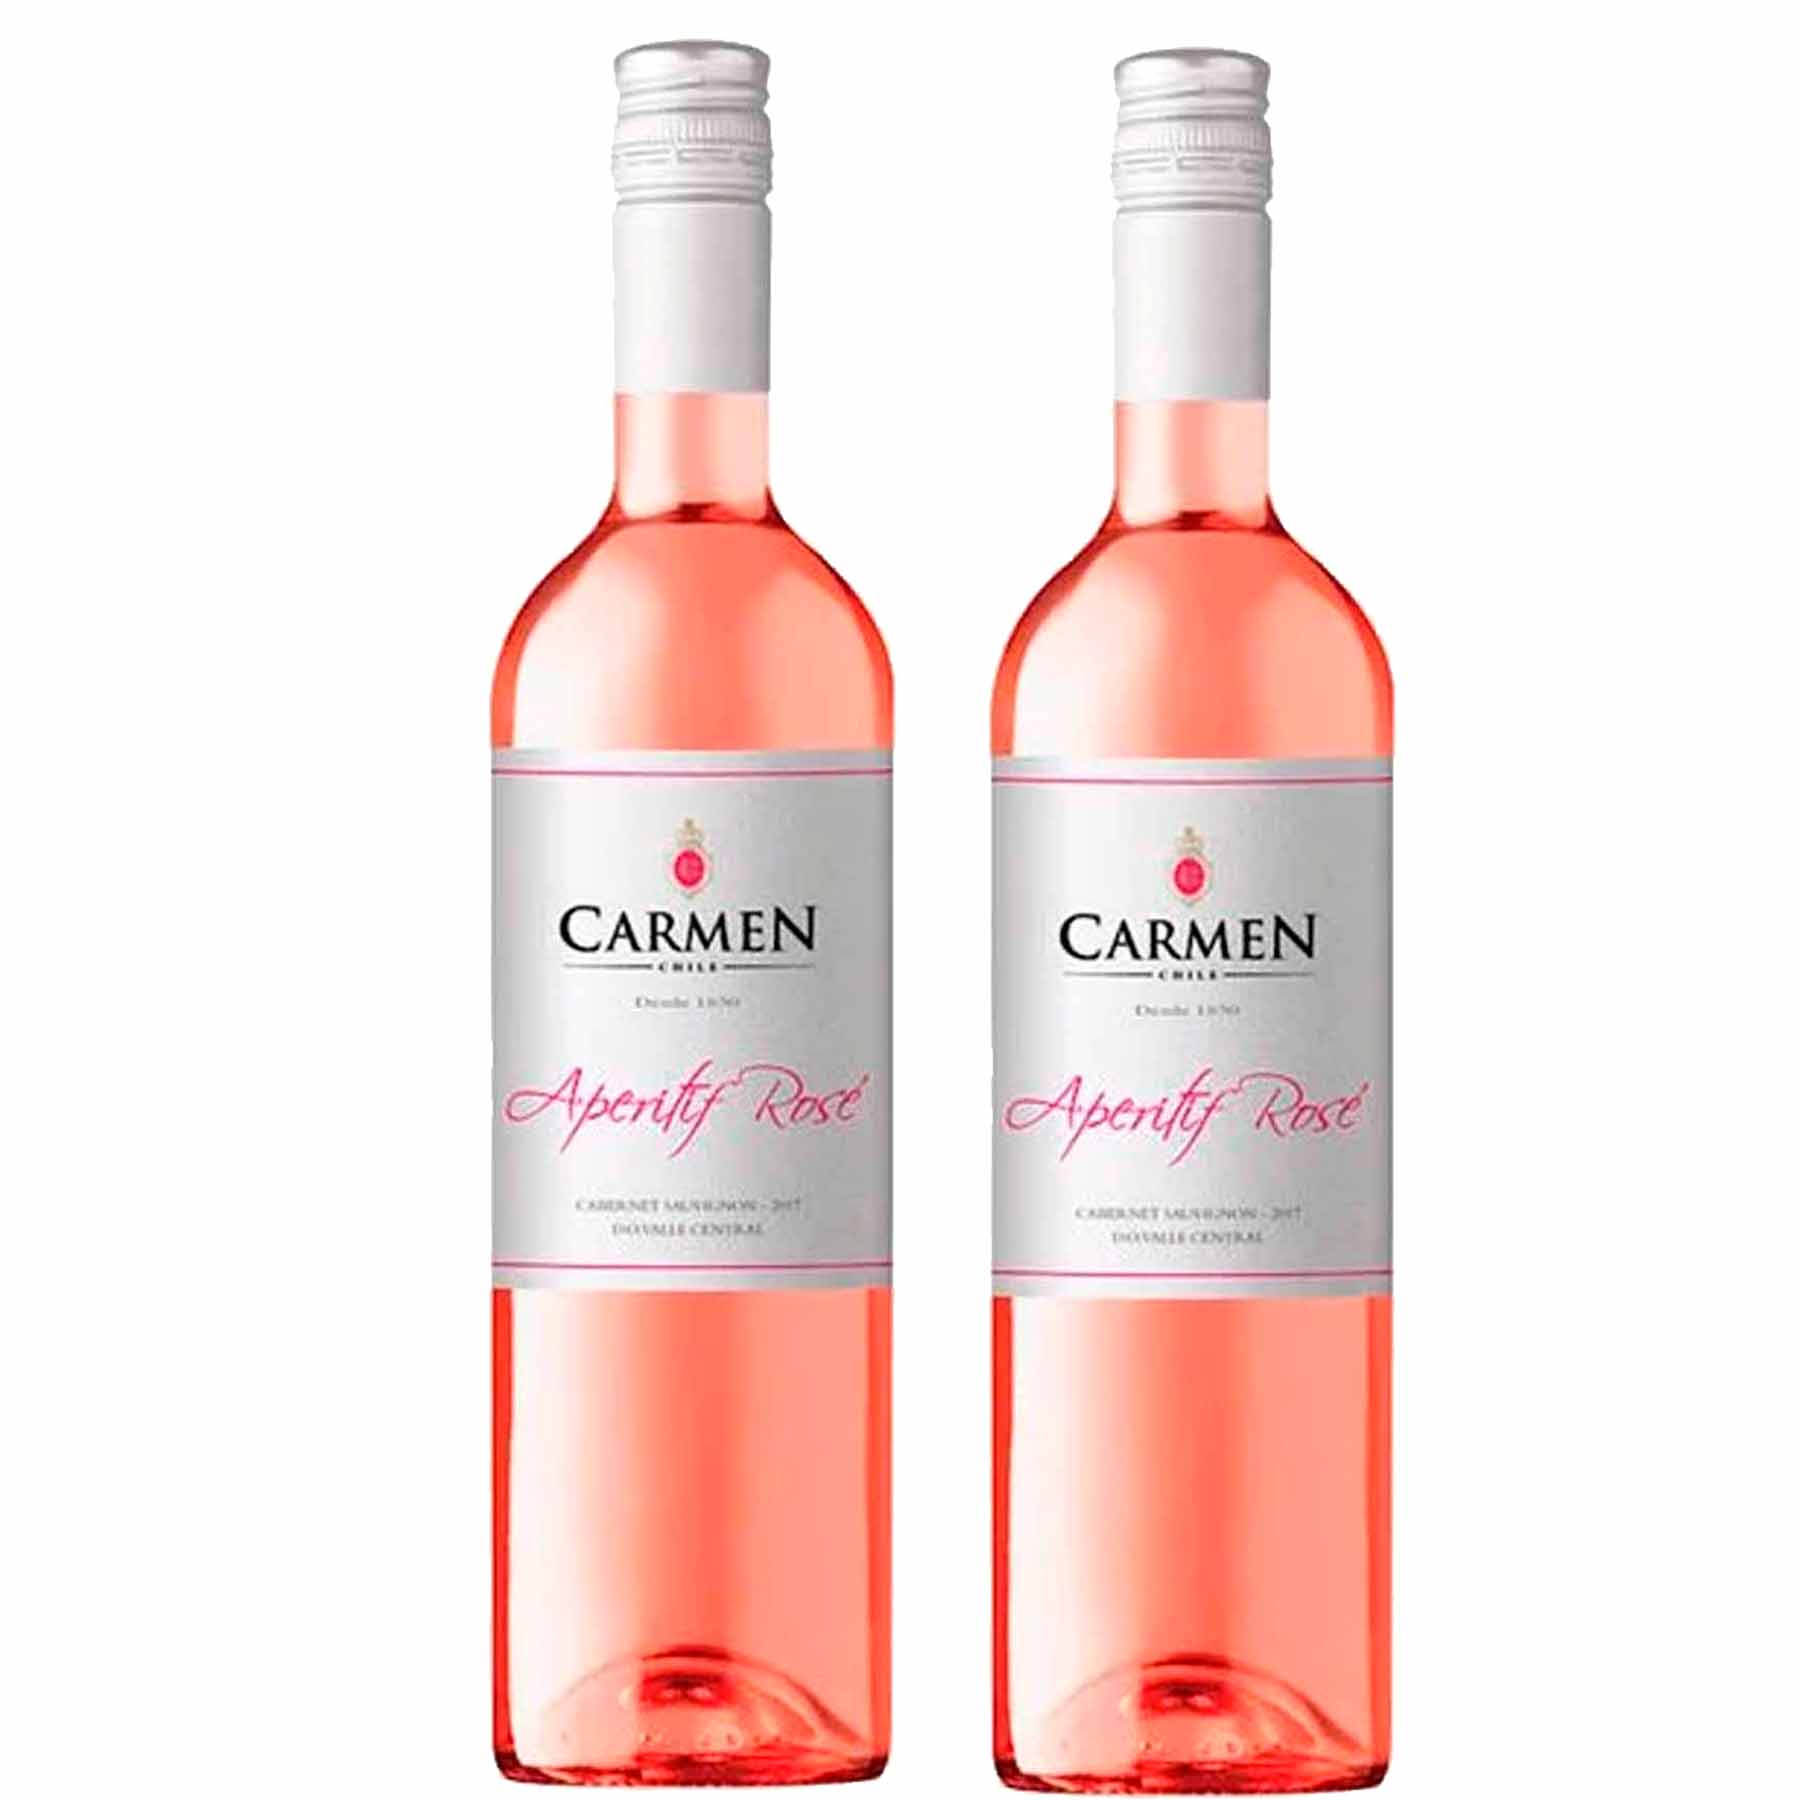 Kit 3x Vinho Rose Chileno Carmen Insigne Aperitif Cabernet Sauvignon 2019